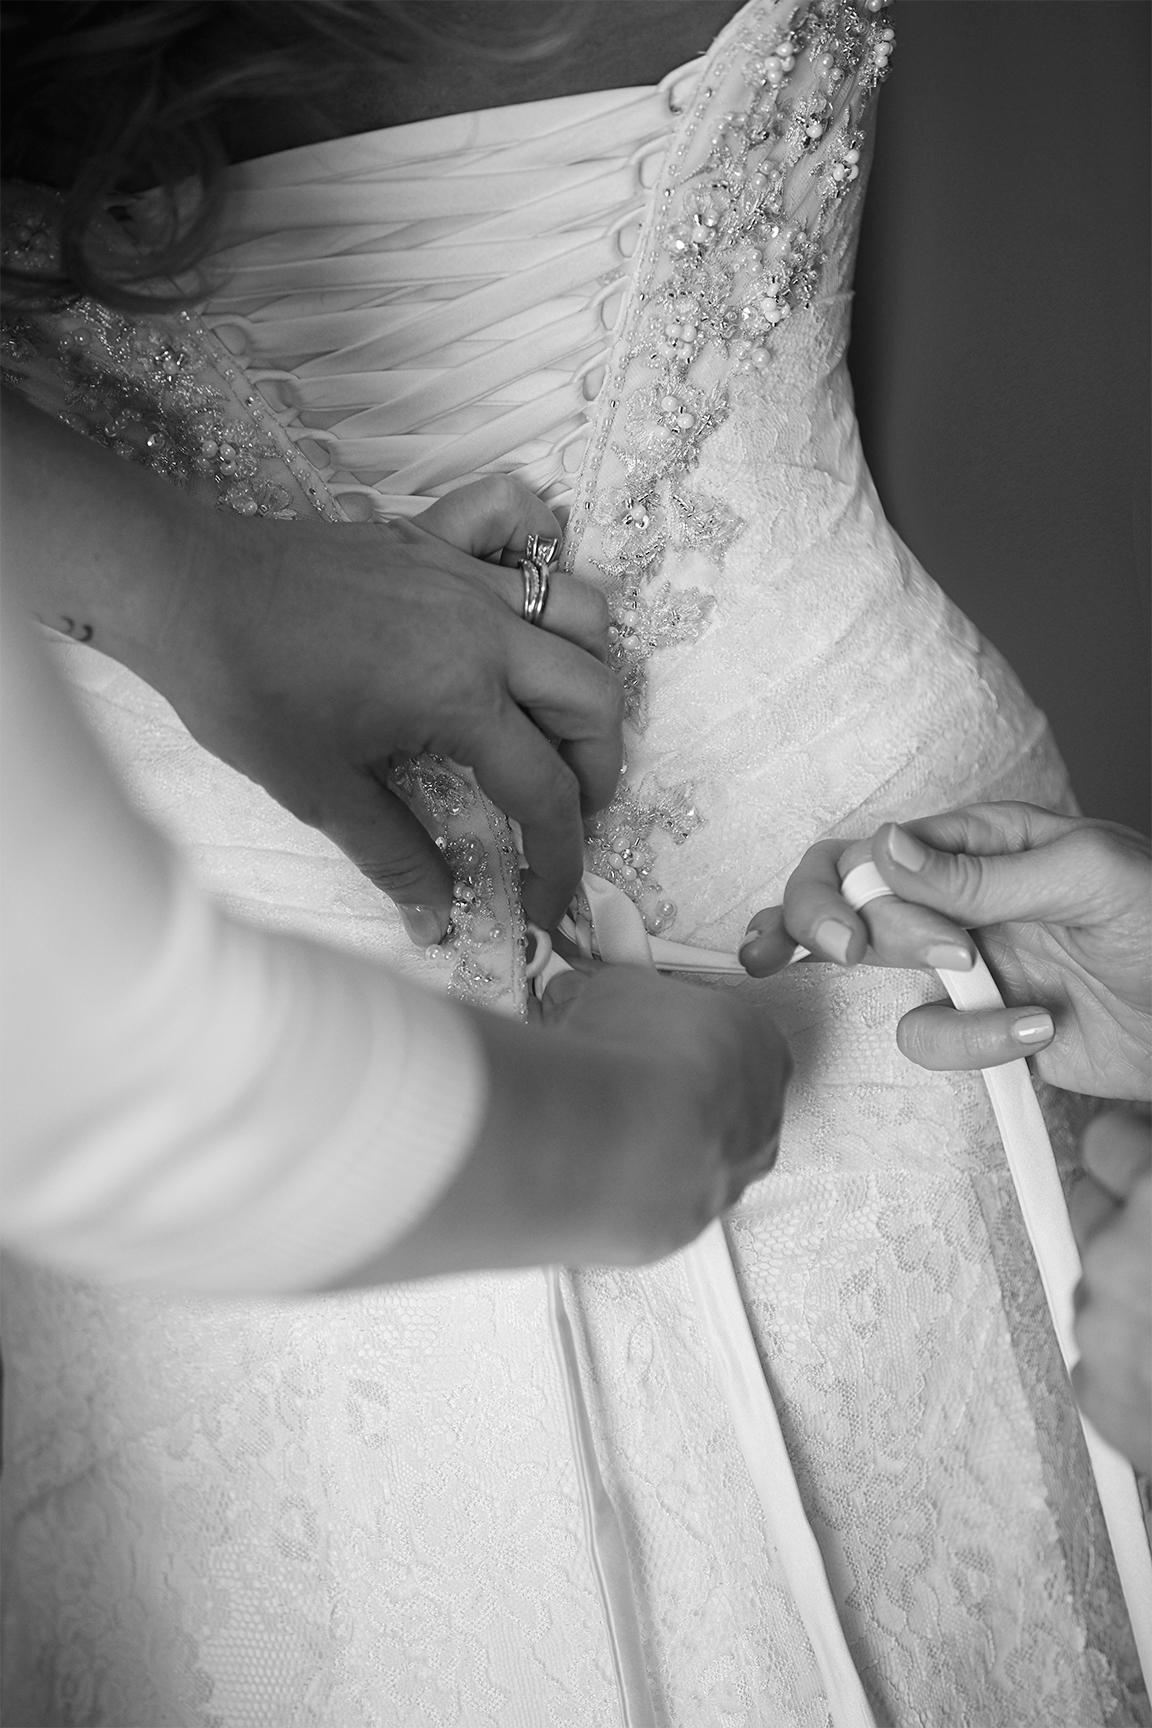 _RNE5151Tina-And-Miles-Wedding_N,2015_Raleigh_NC_ErnestoSue408.jpeg